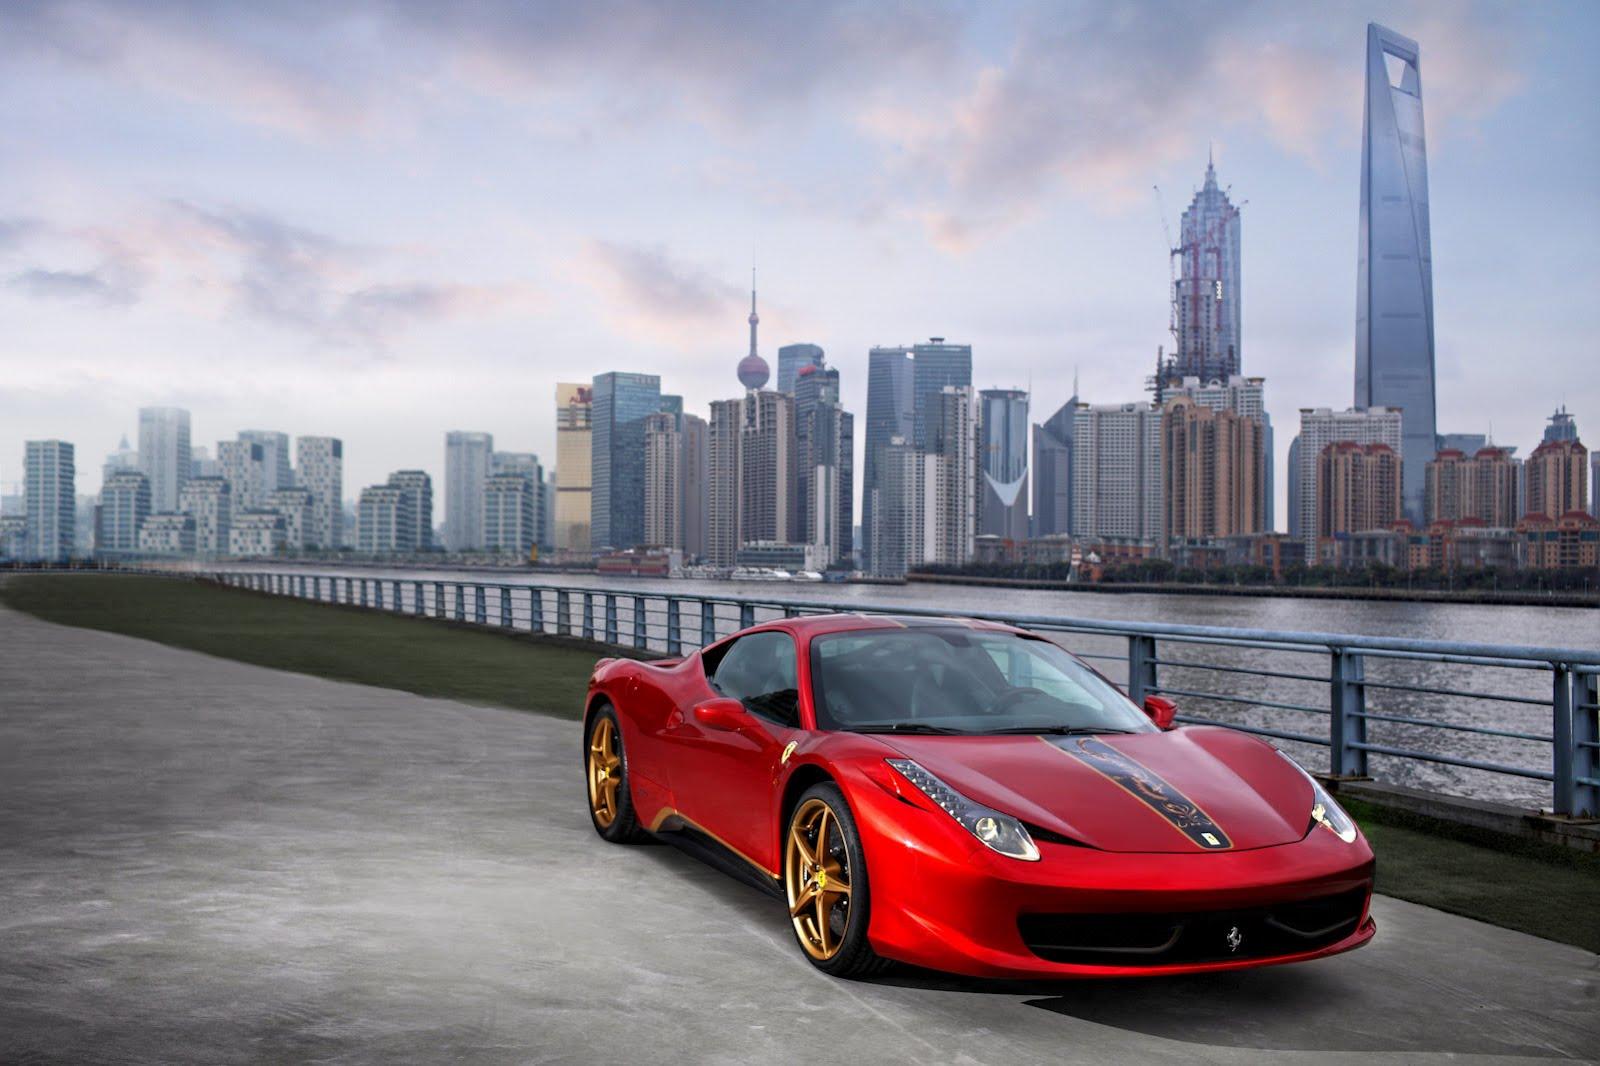 Ferrari 458 Italia China anniversary edition